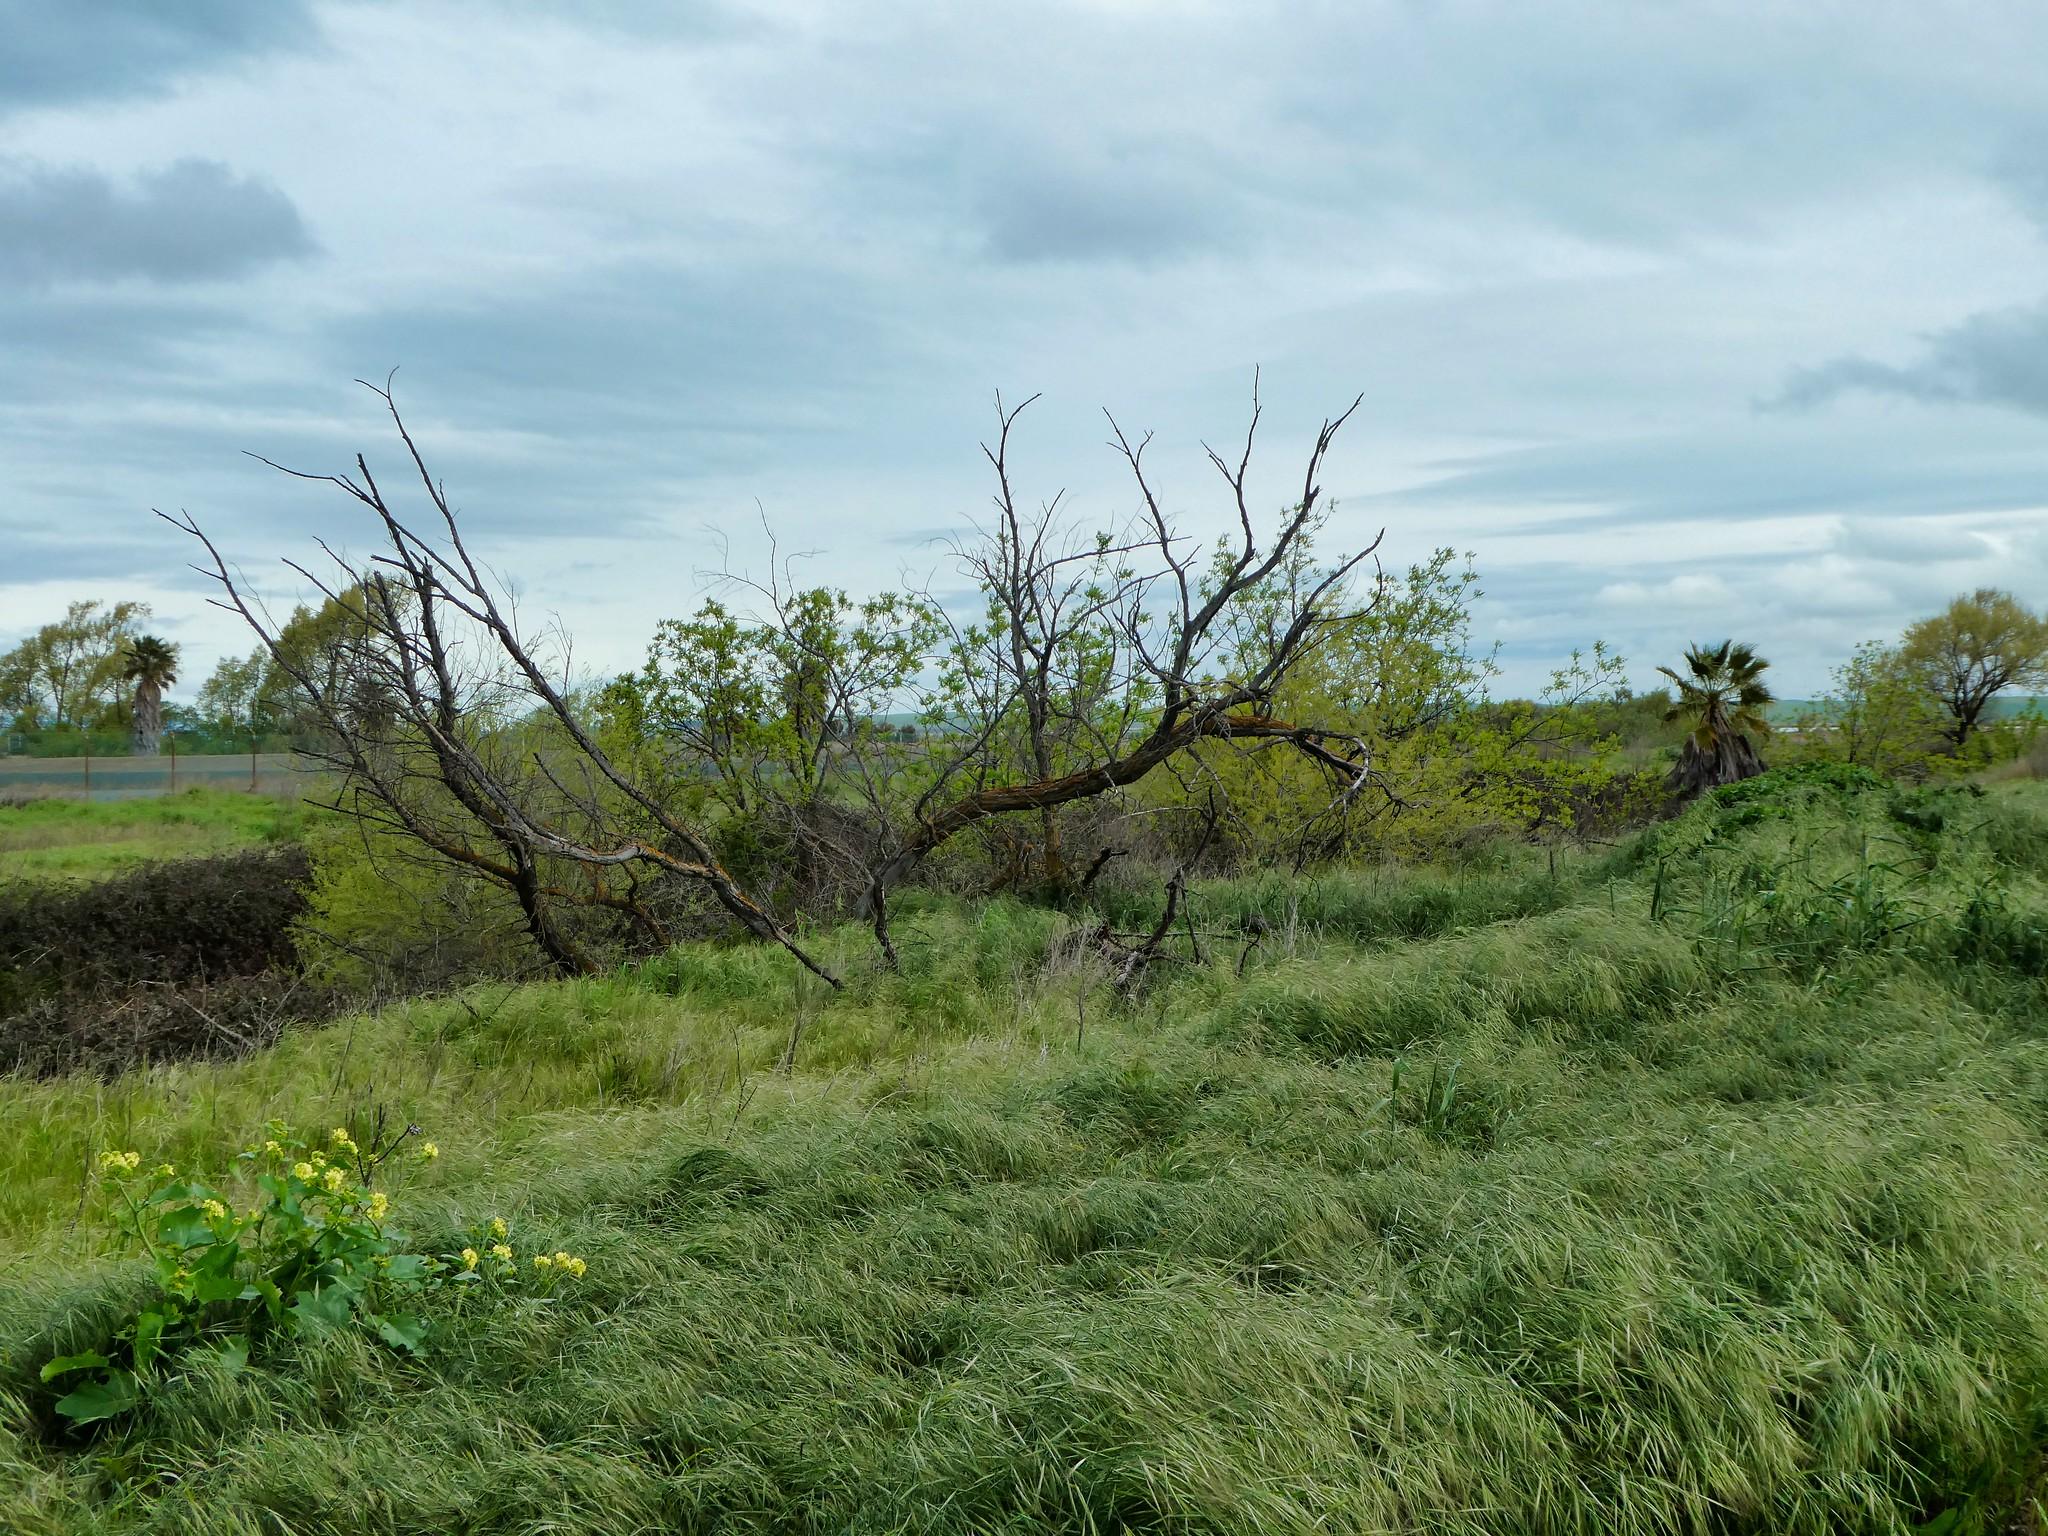 2019-04-04 - Outdoor Photography - Nature - Dow Wetlands